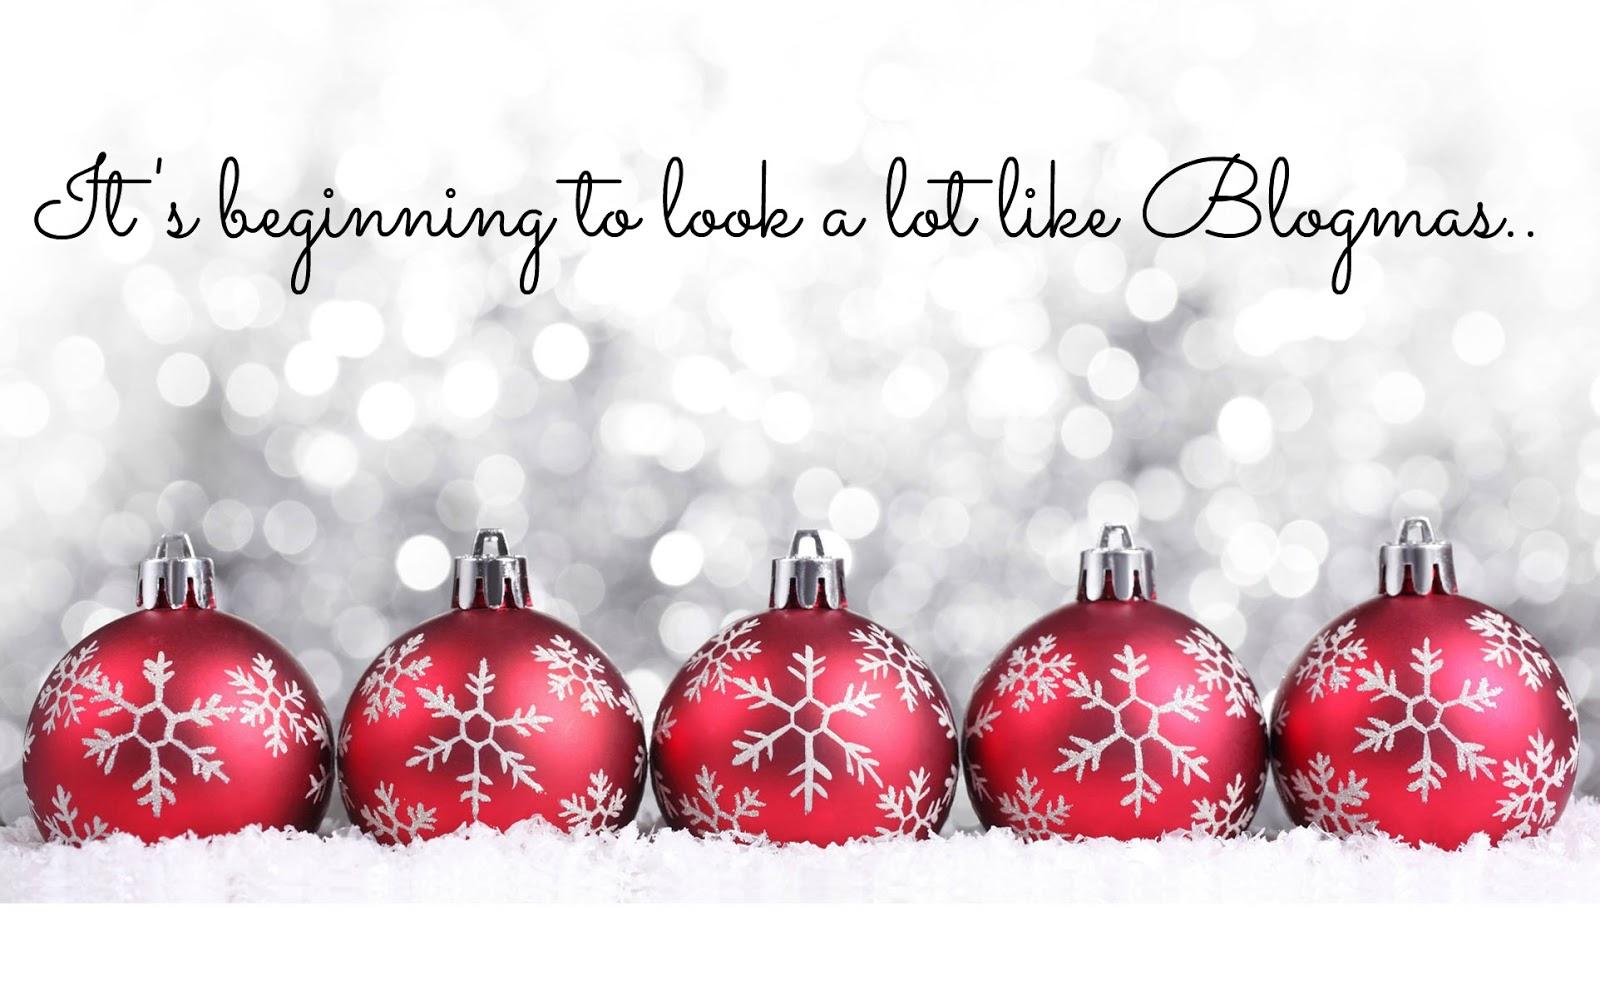 Blogmas 2014 | Vanity Fairest